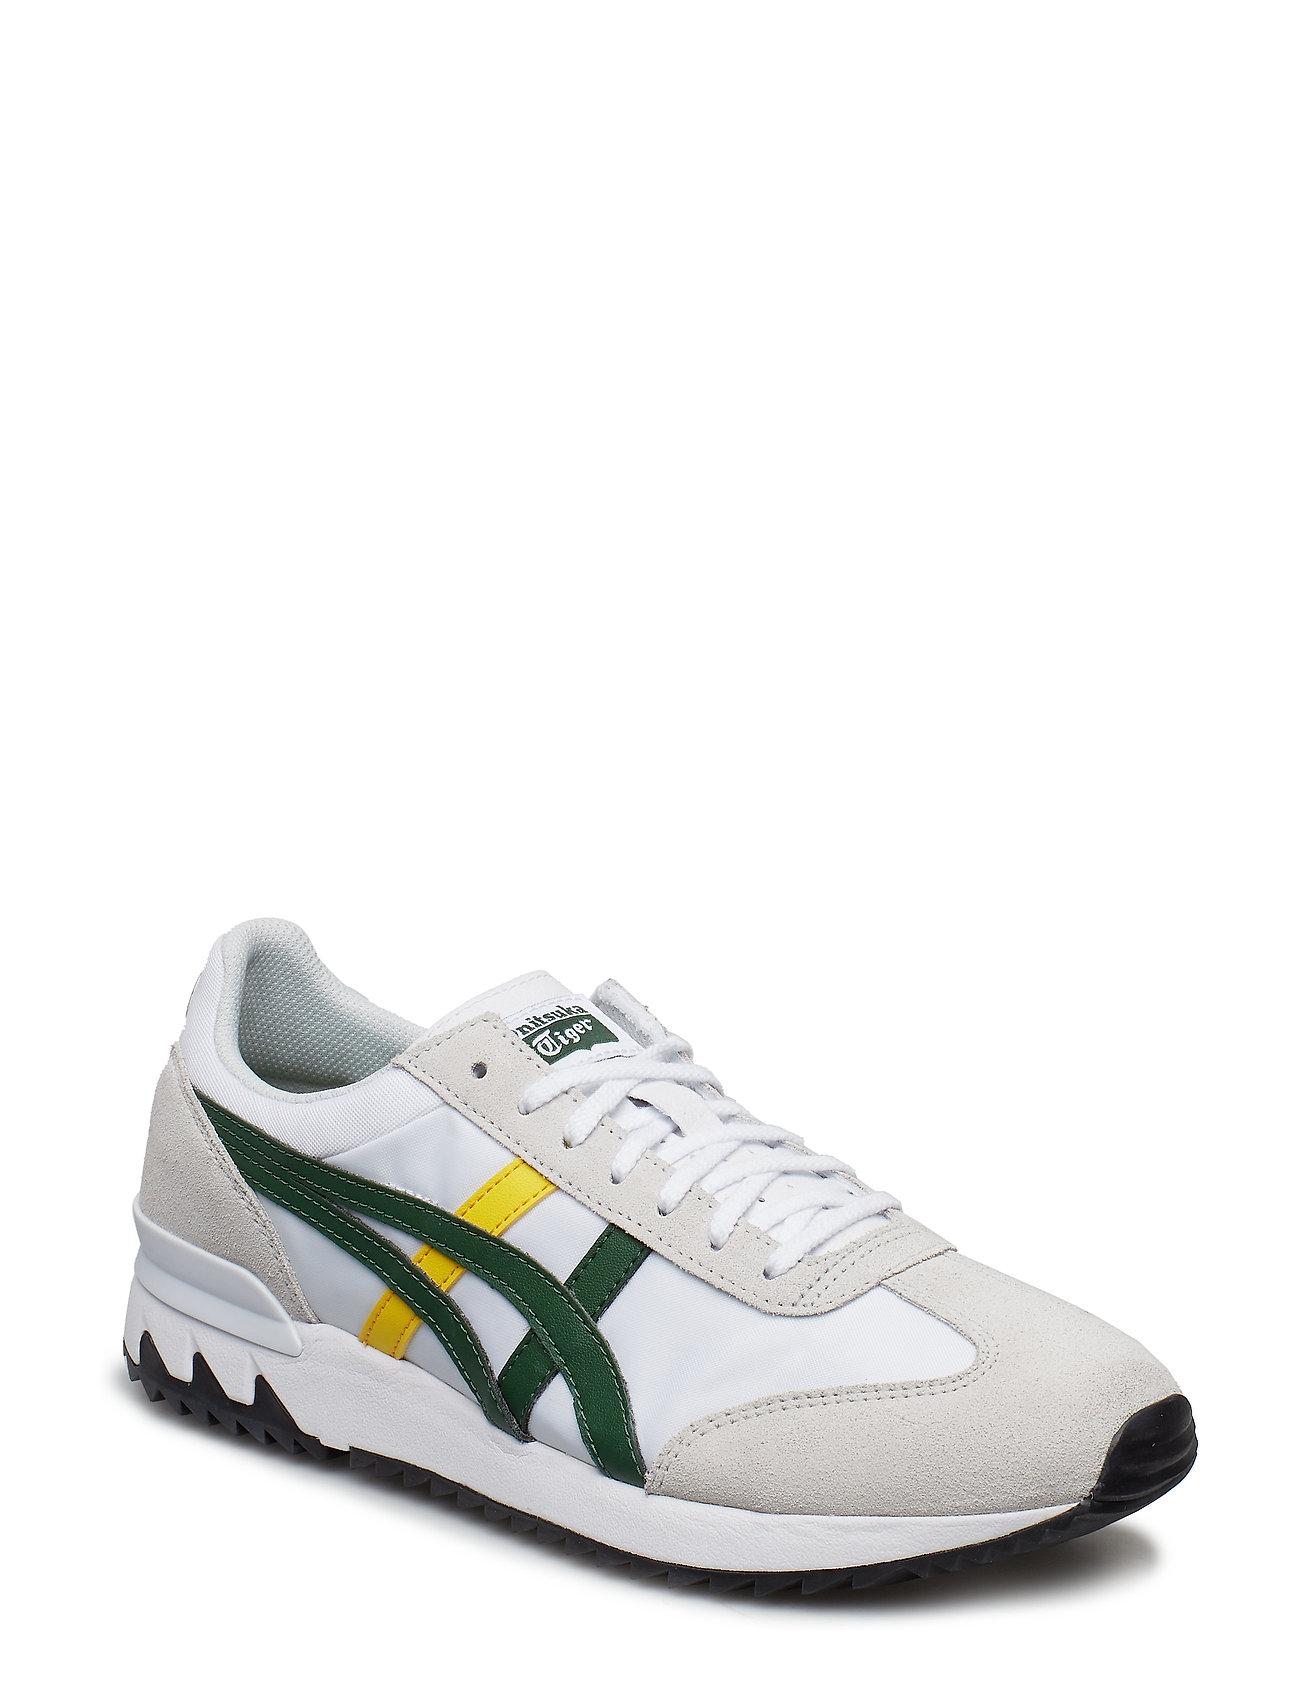 ec2ba97c7ca2 California 78 Ex (White hunter Green) (90 €) - Onitsuka Tiger ...